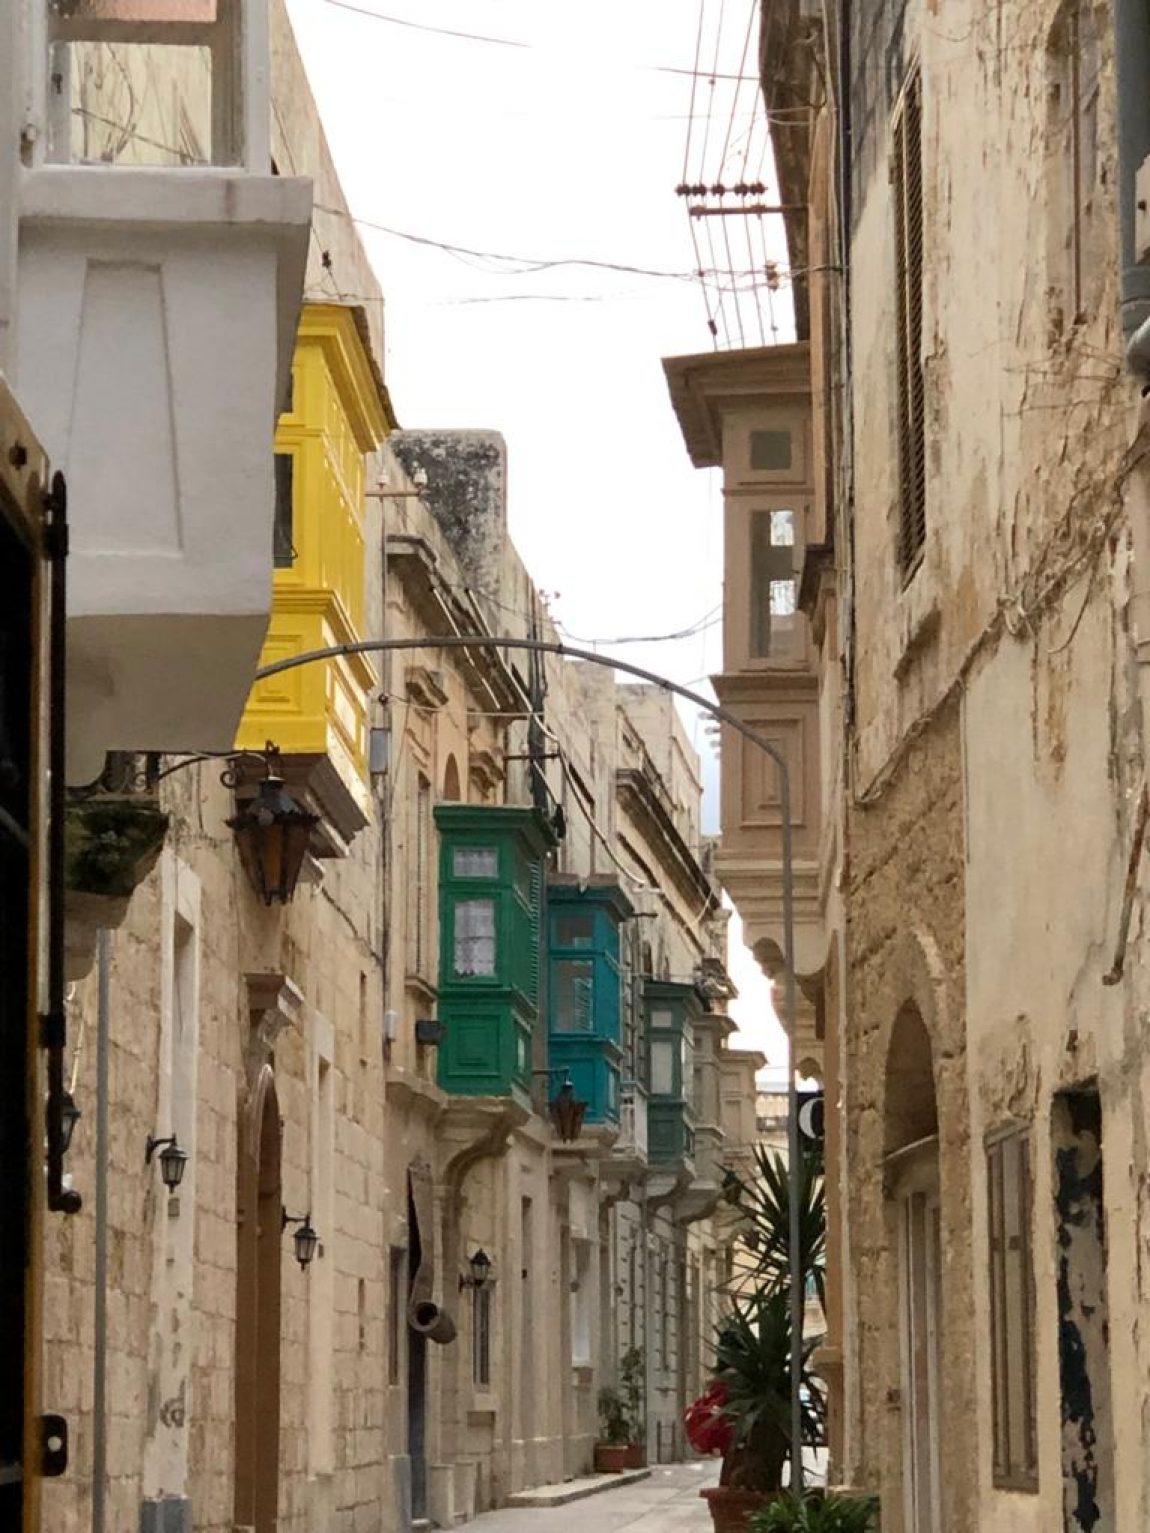 A street in Rabat Town Core